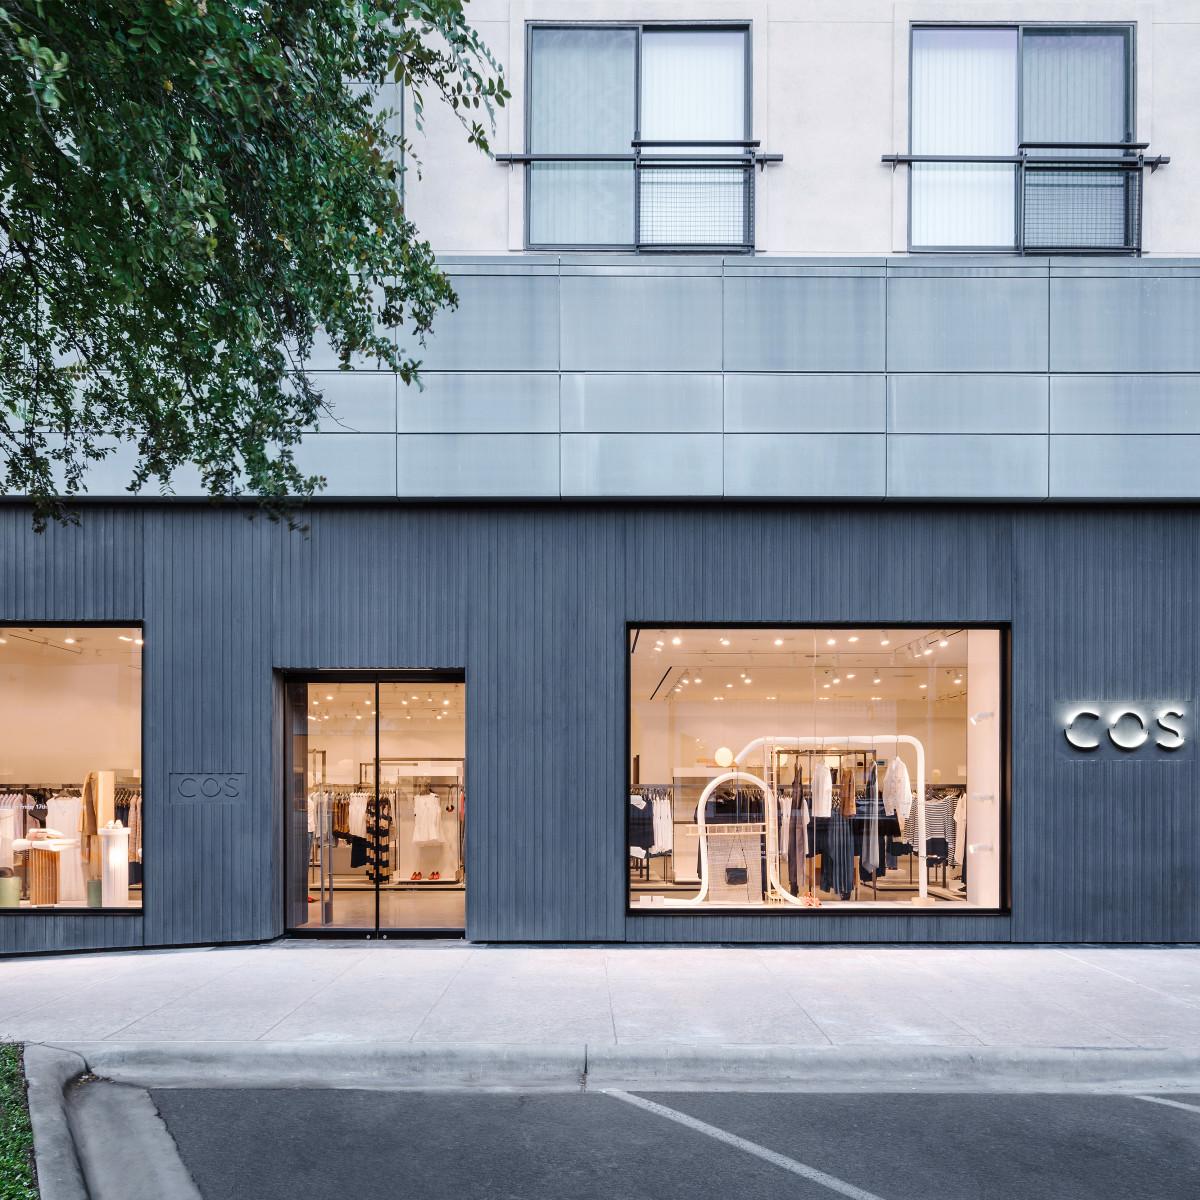 COS Austin store